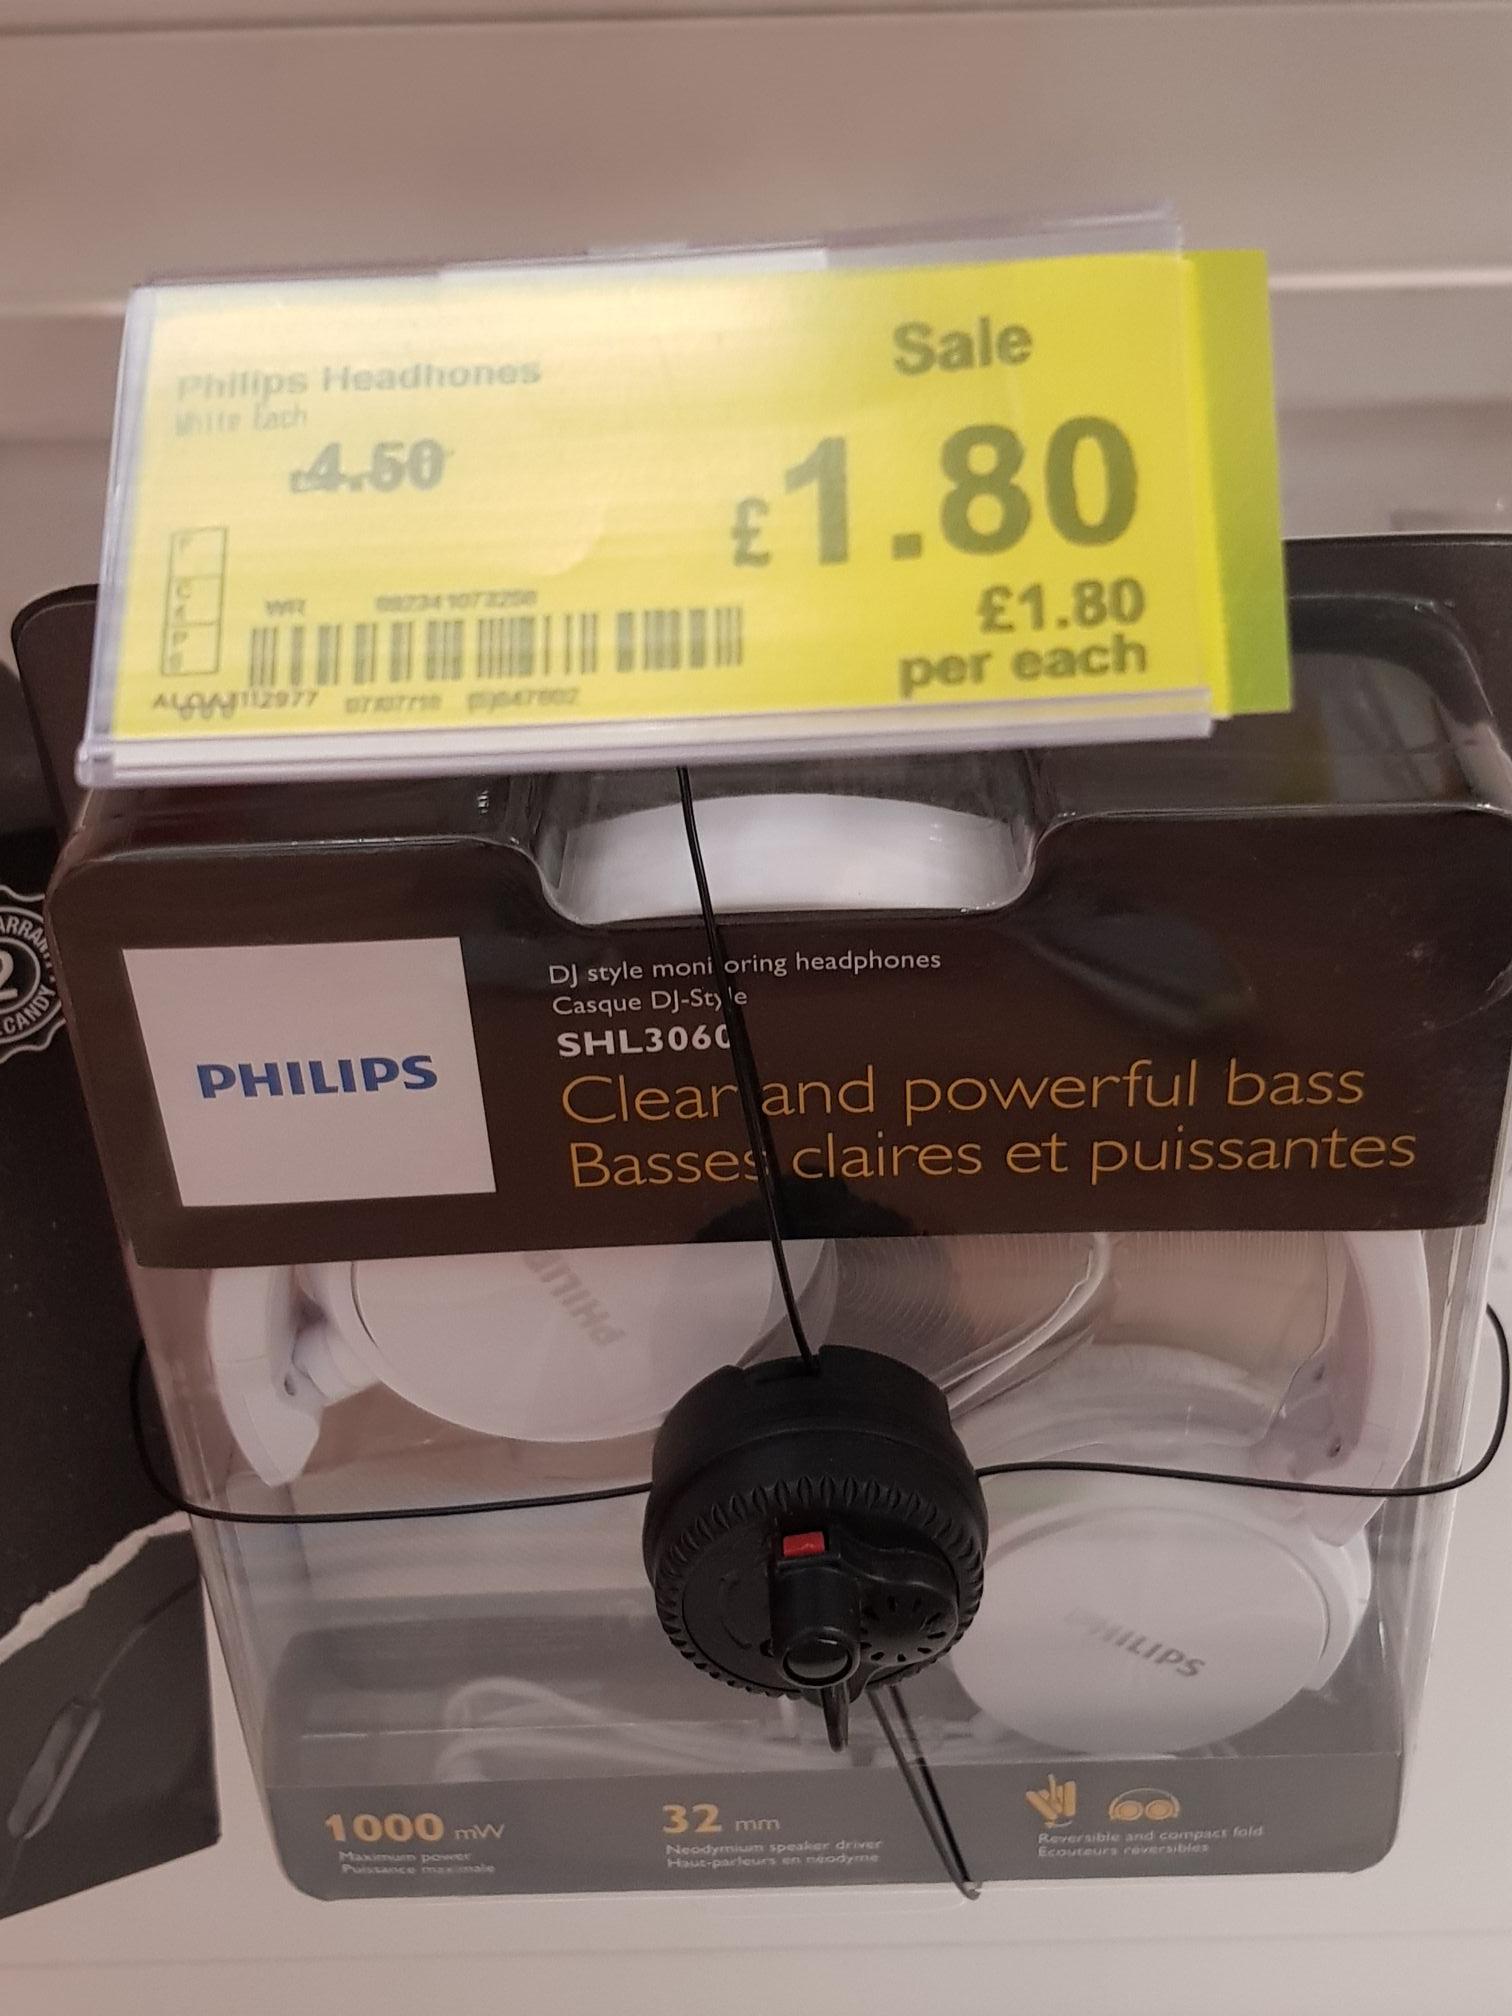 Phillips headphones £1.80 @ ASDA instore